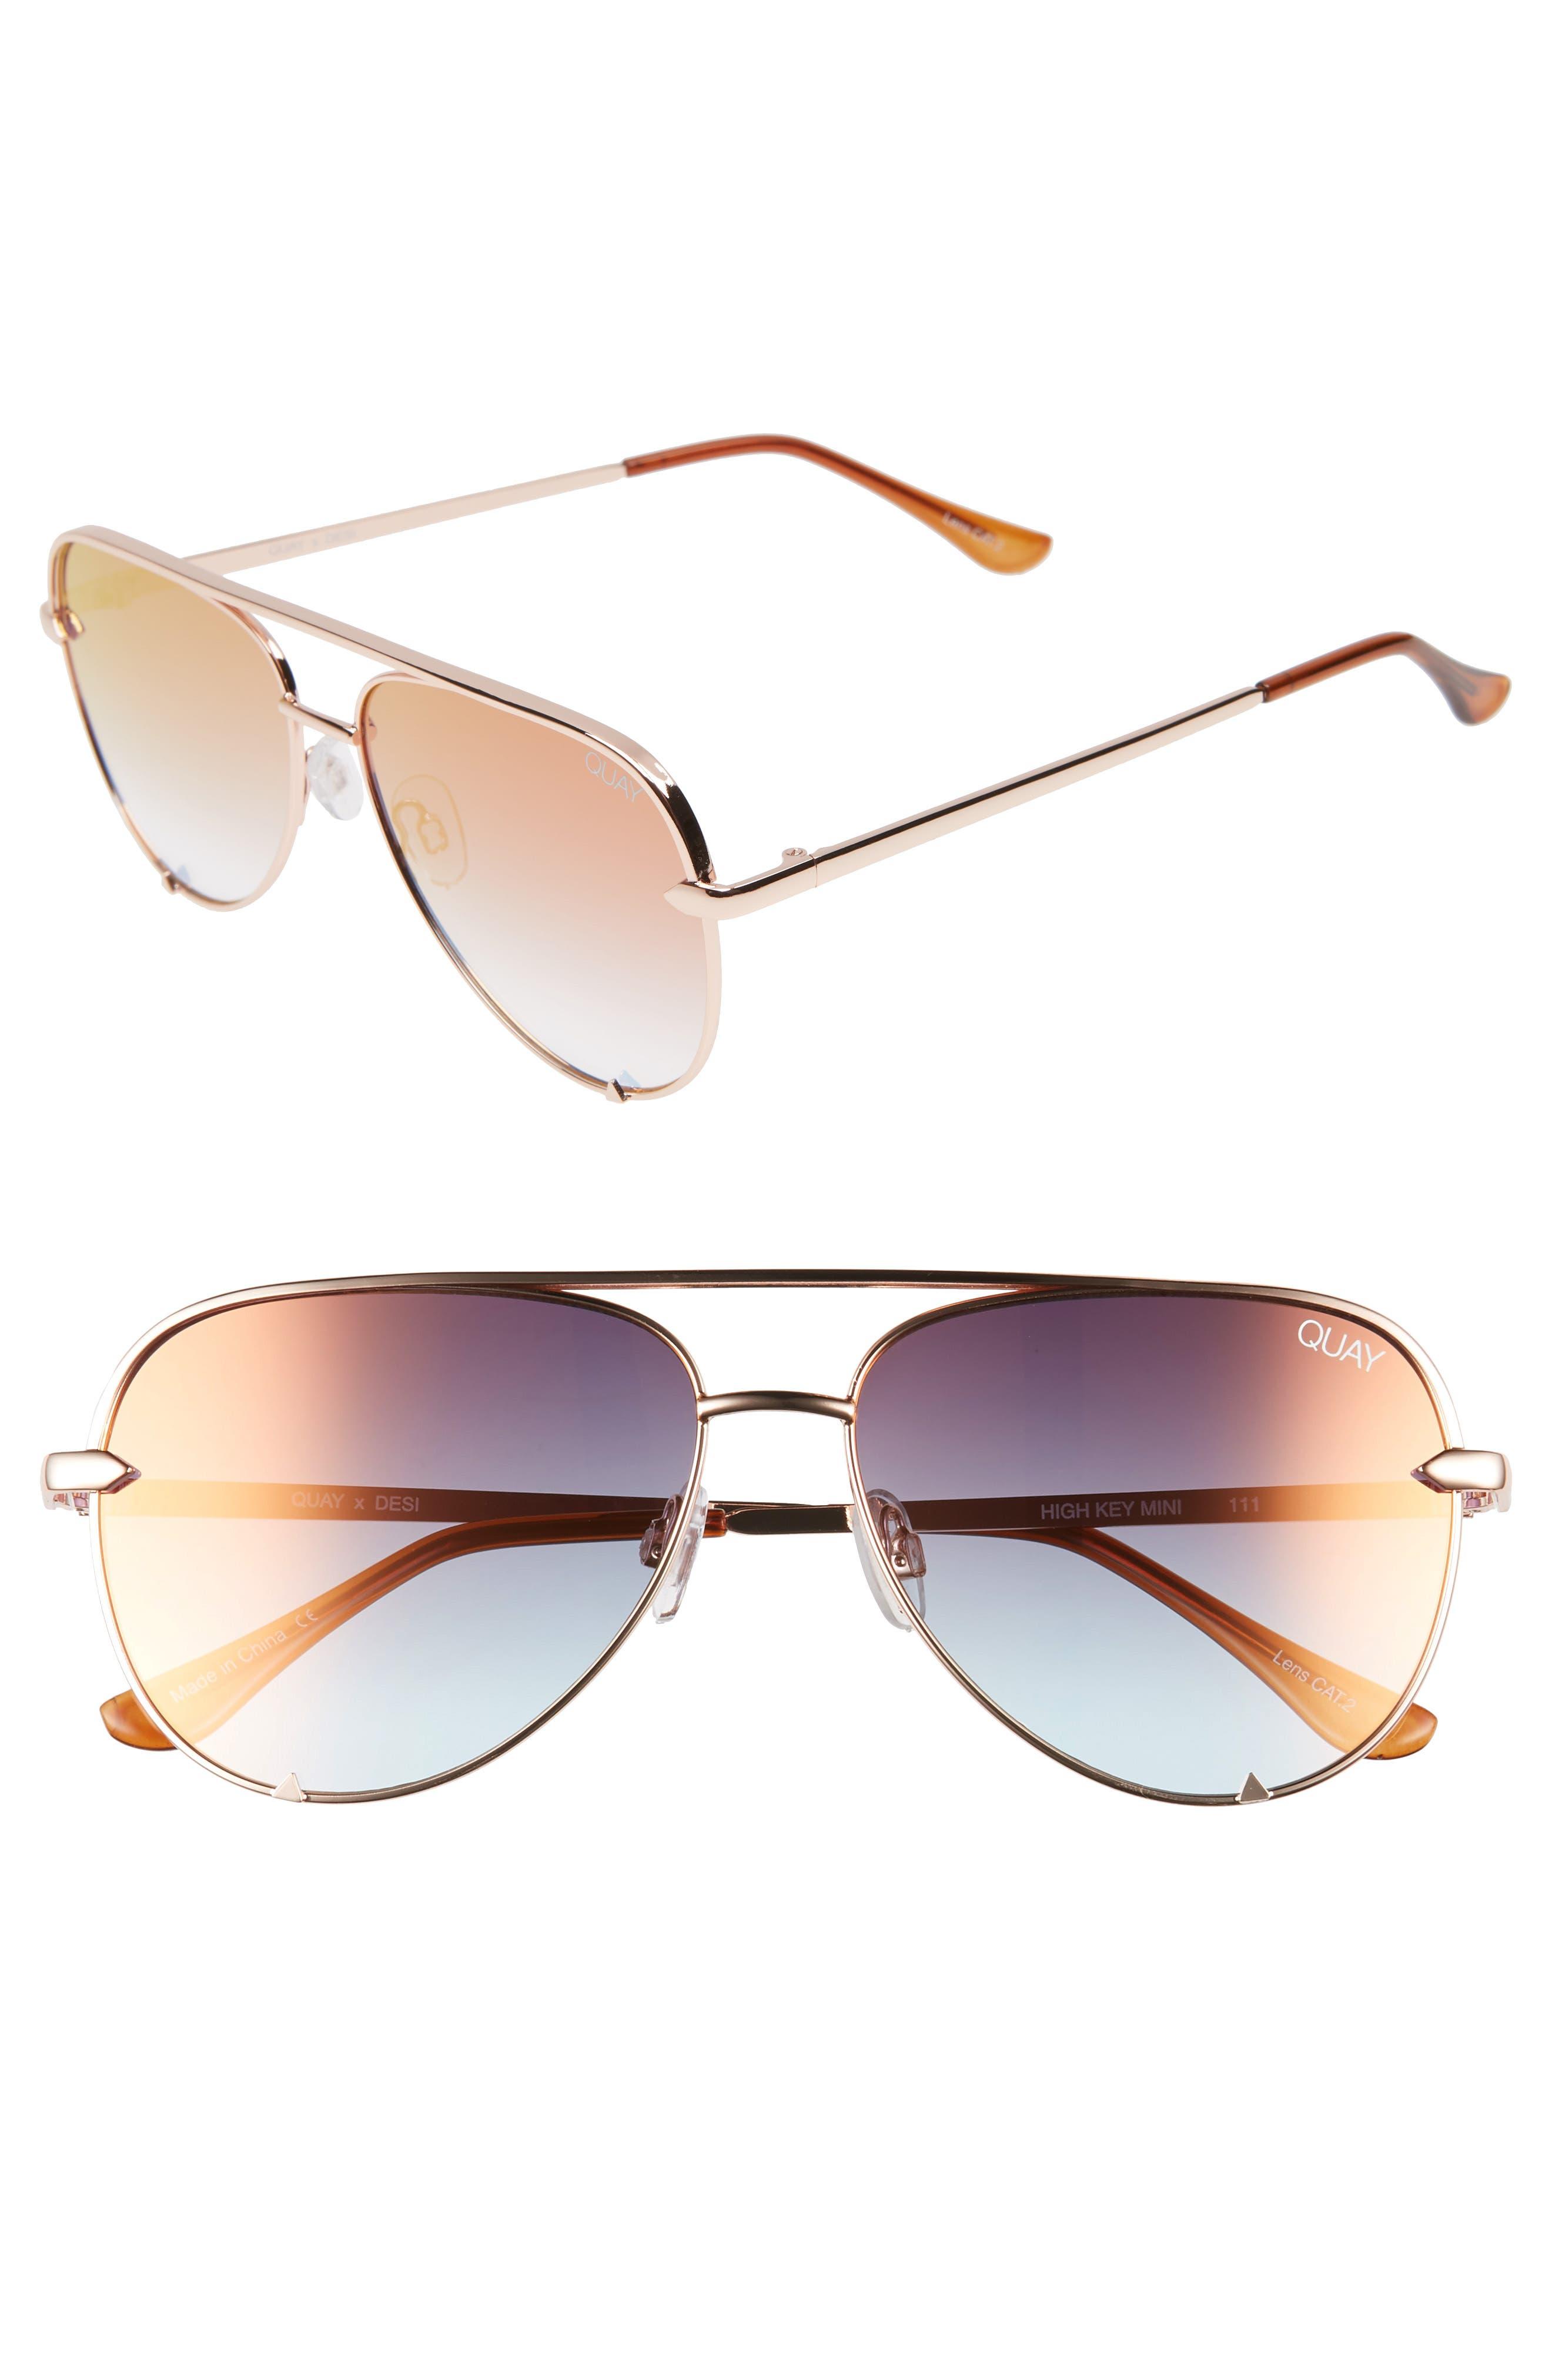 x Desi Perkins High Key Mini 57mm Aviator Sunglasses,                             Main thumbnail 1, color,                             ROSE/ CPRFD